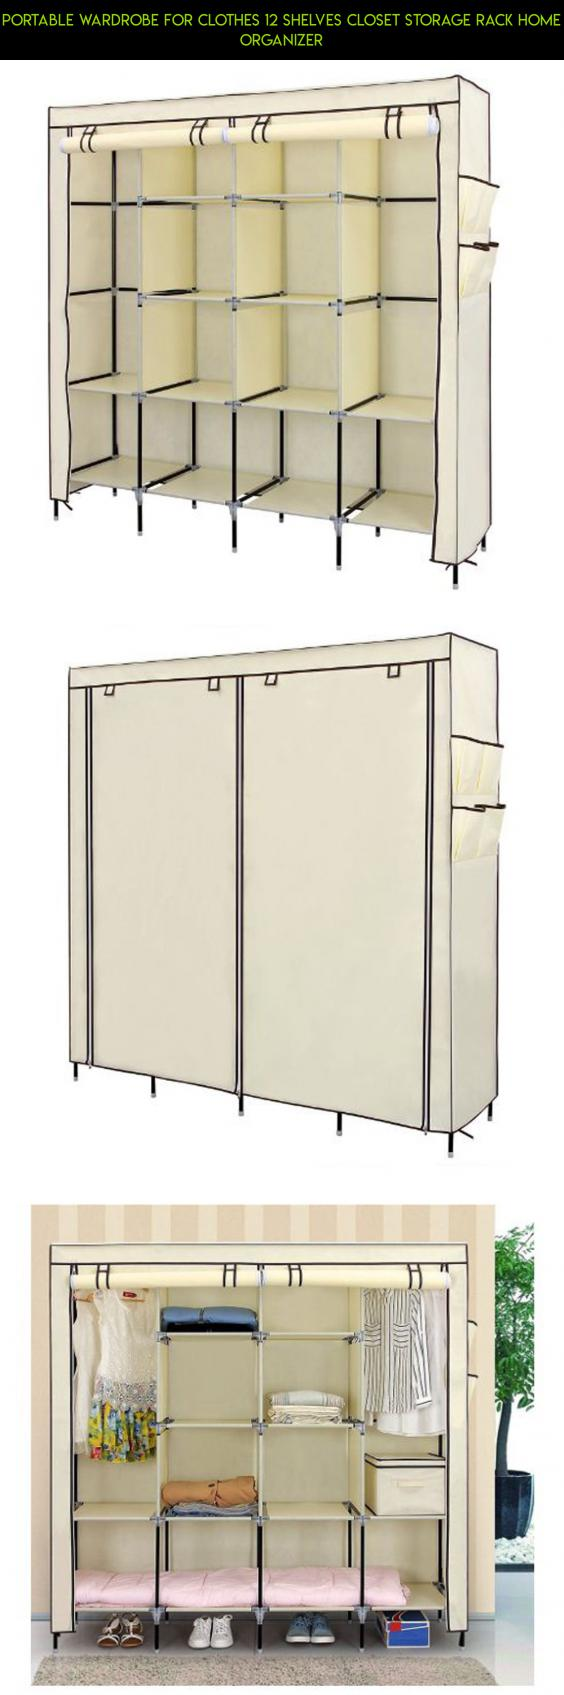 Portable wardrobe for clothes shelves closet storage rack home